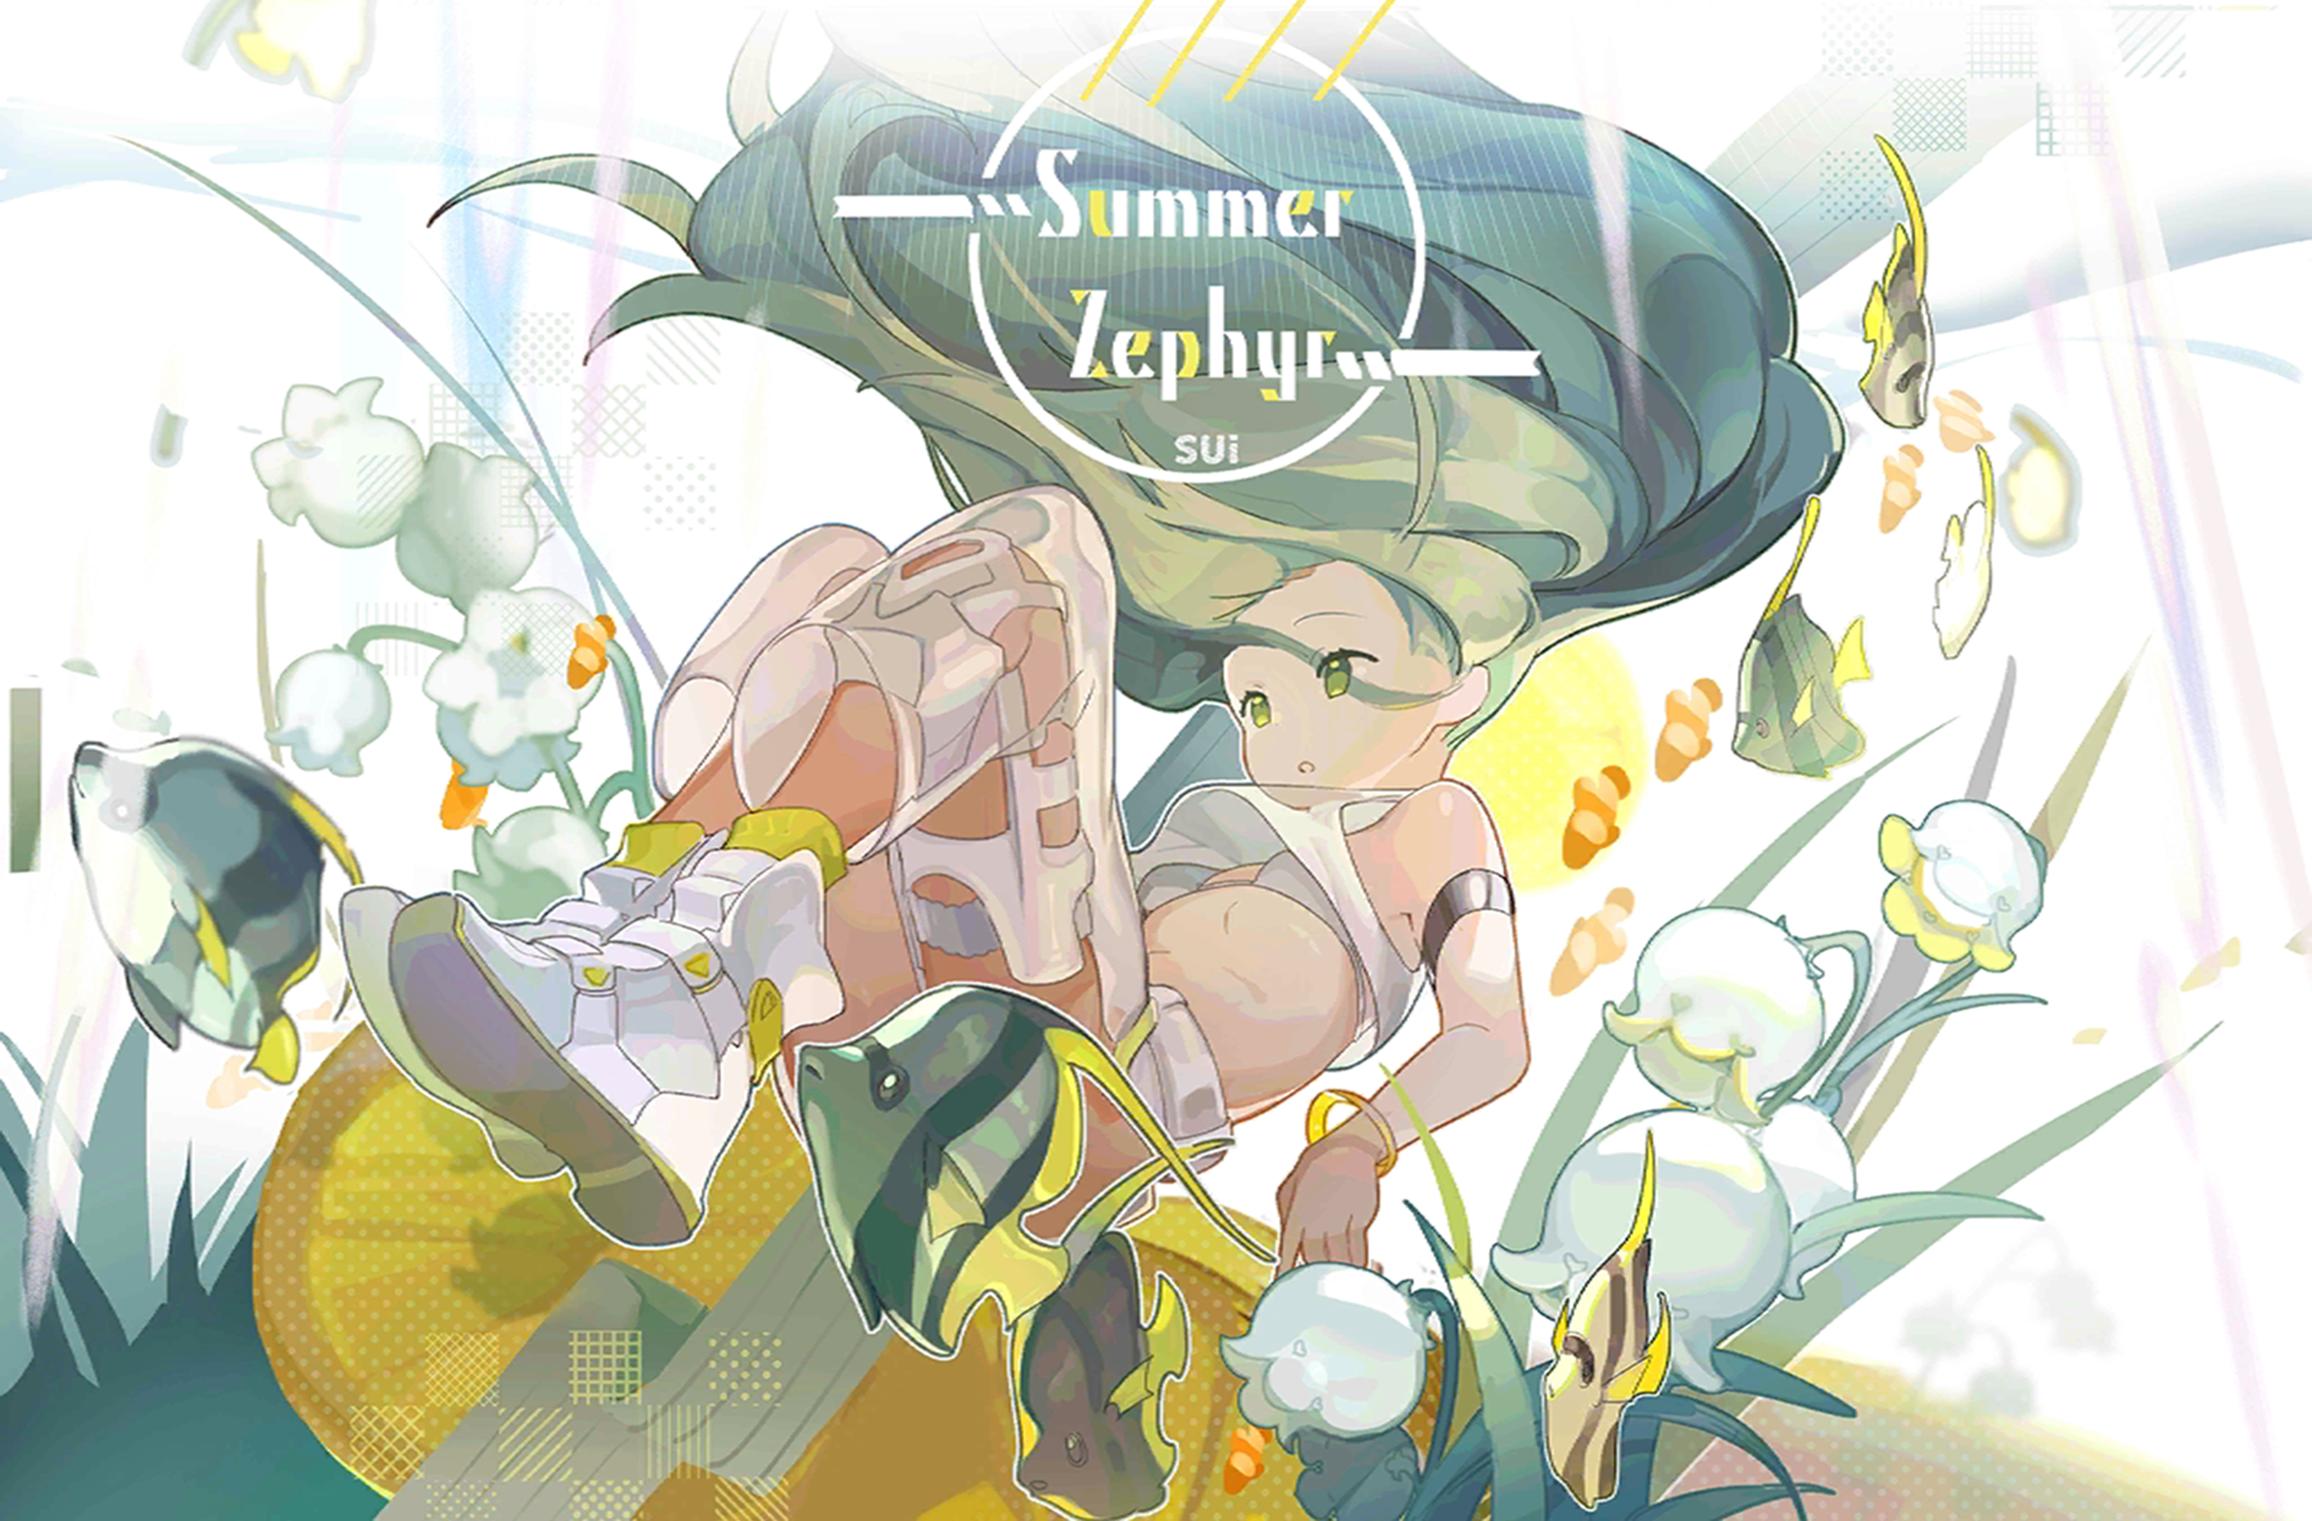 Summer Zephyr